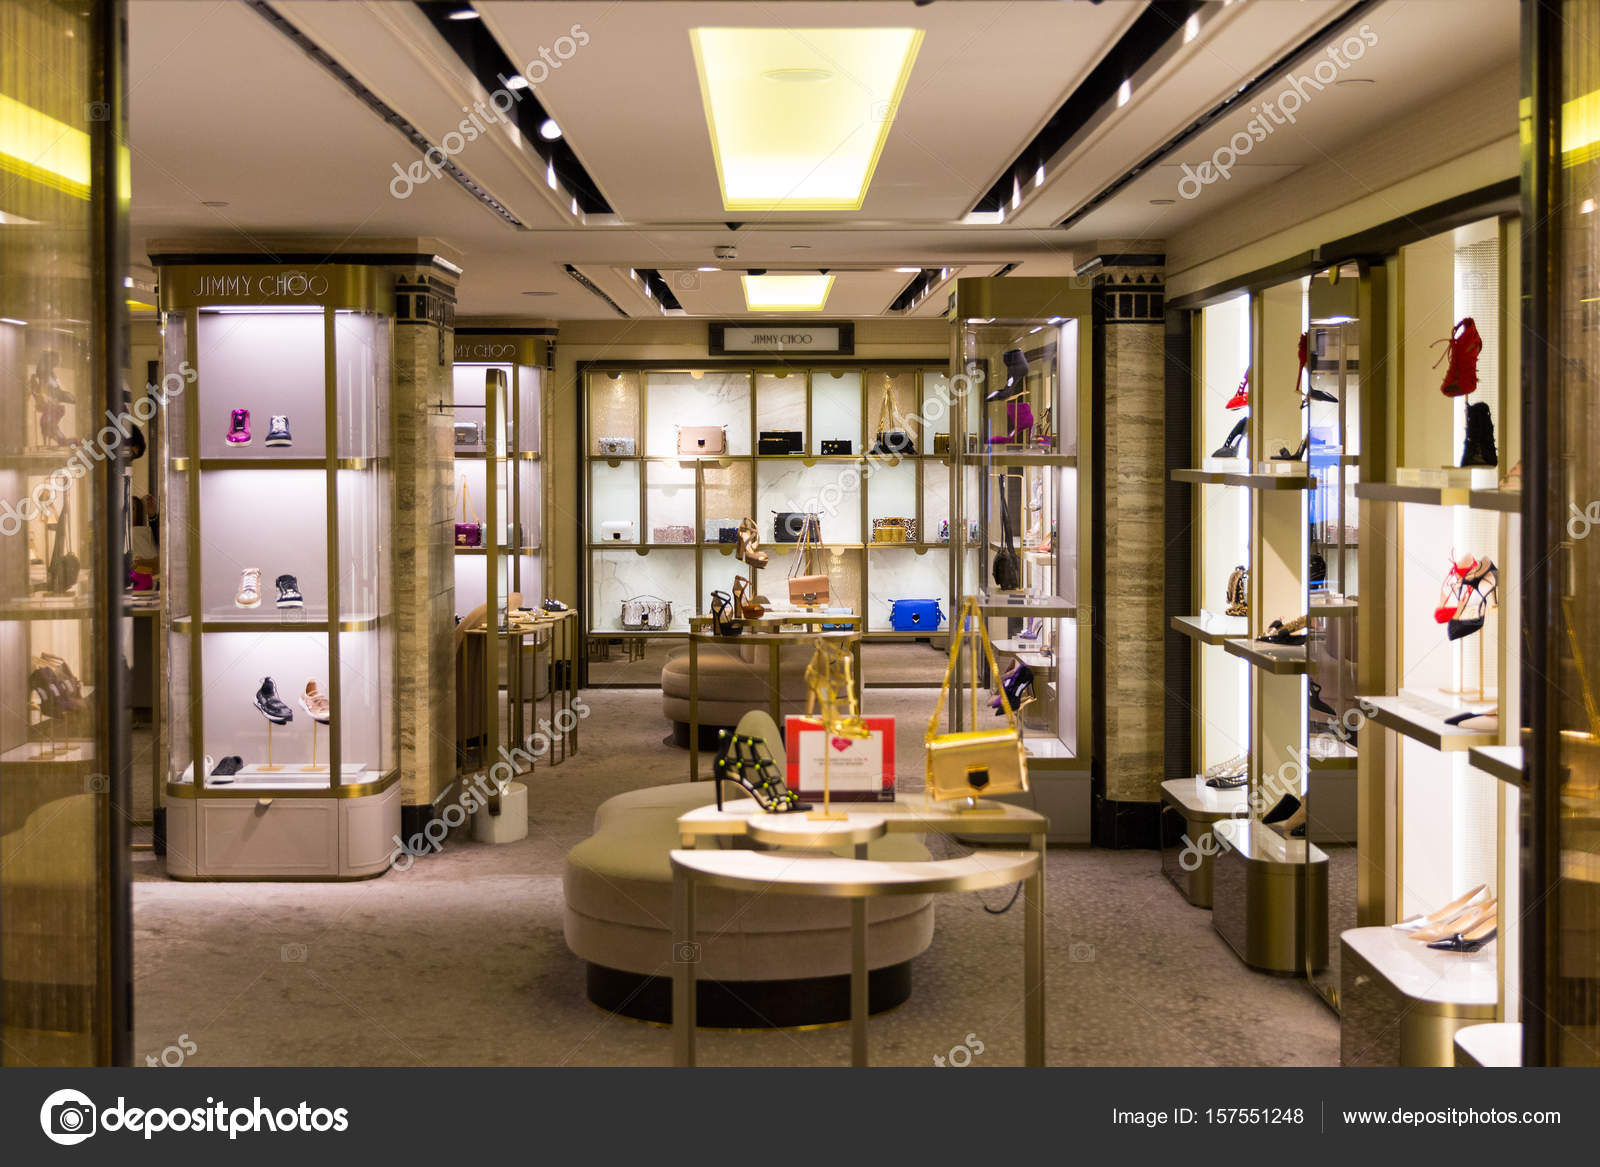 londres angleterre 4 avril 2017 intrieur du clbre magasin harrods sur 4 avril 2017 knightsbridge londres harrods est le plus grand magasin en